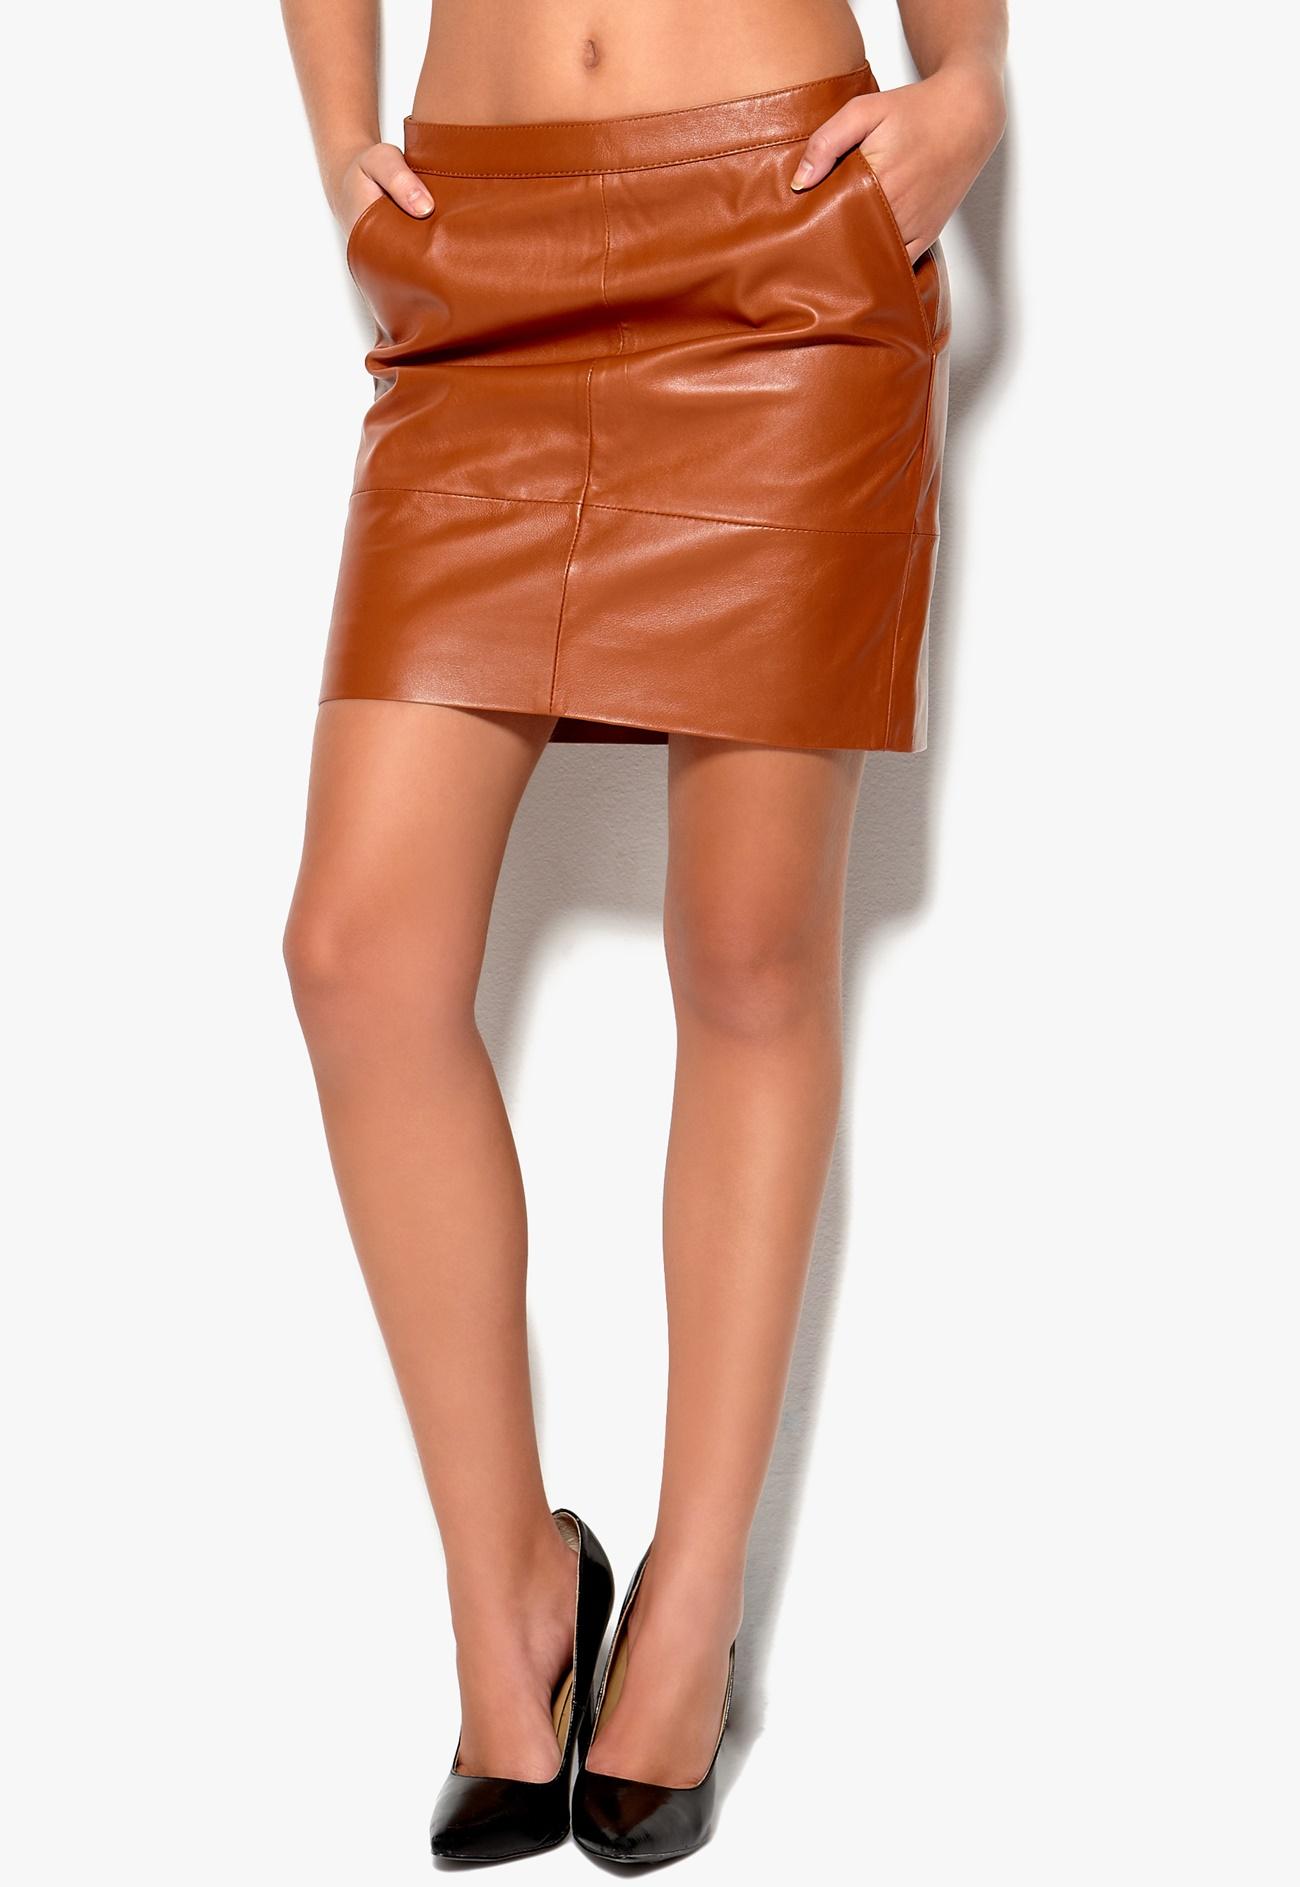 Mexx Leather Skirt 979-Metropol. Cognac - Bubbleroom